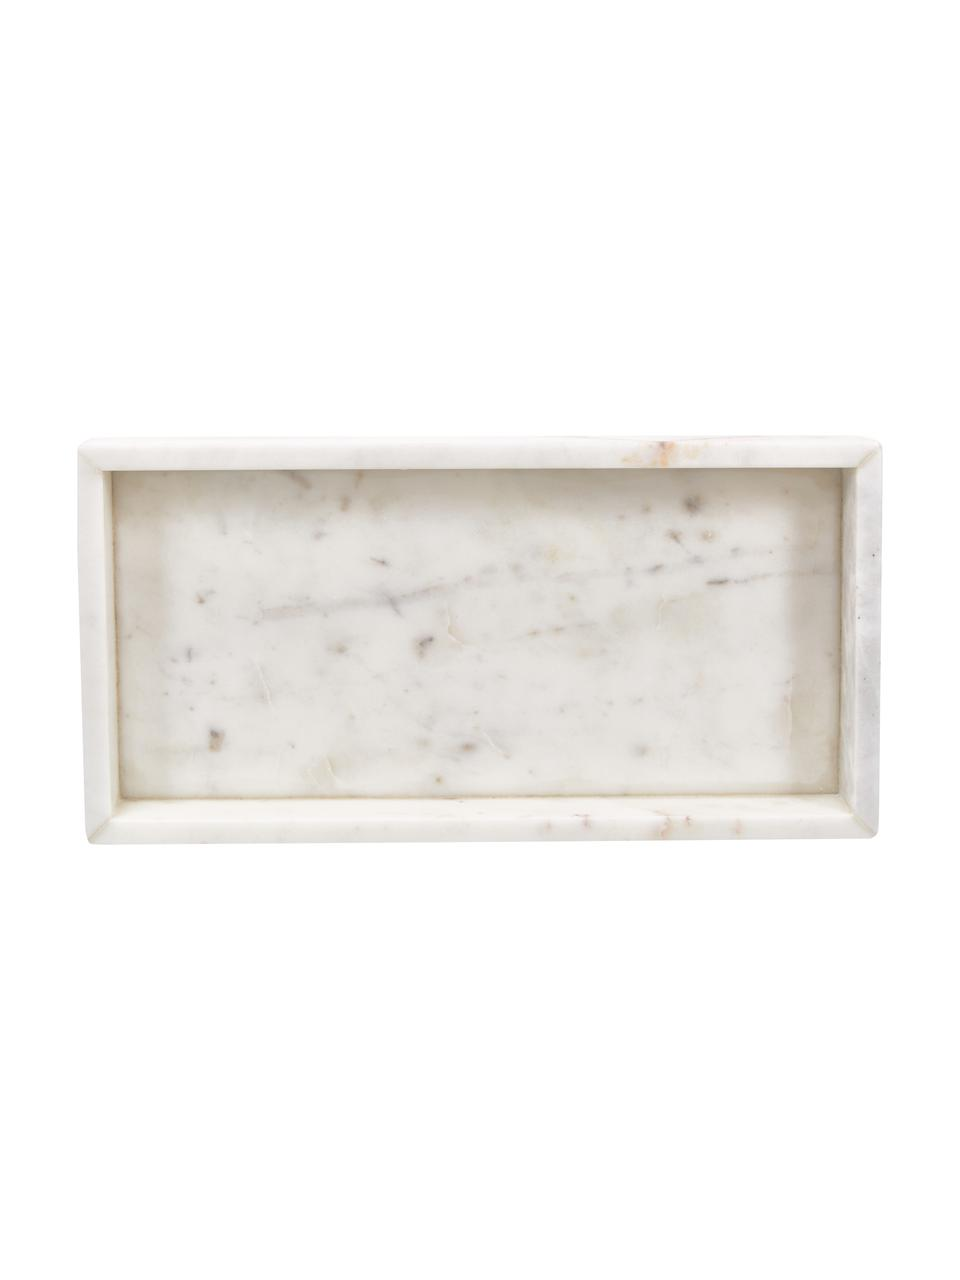 Deko-Marmor-Tablett Sienna in Weiß, Marmor, Weiß, 15 x 4 cm